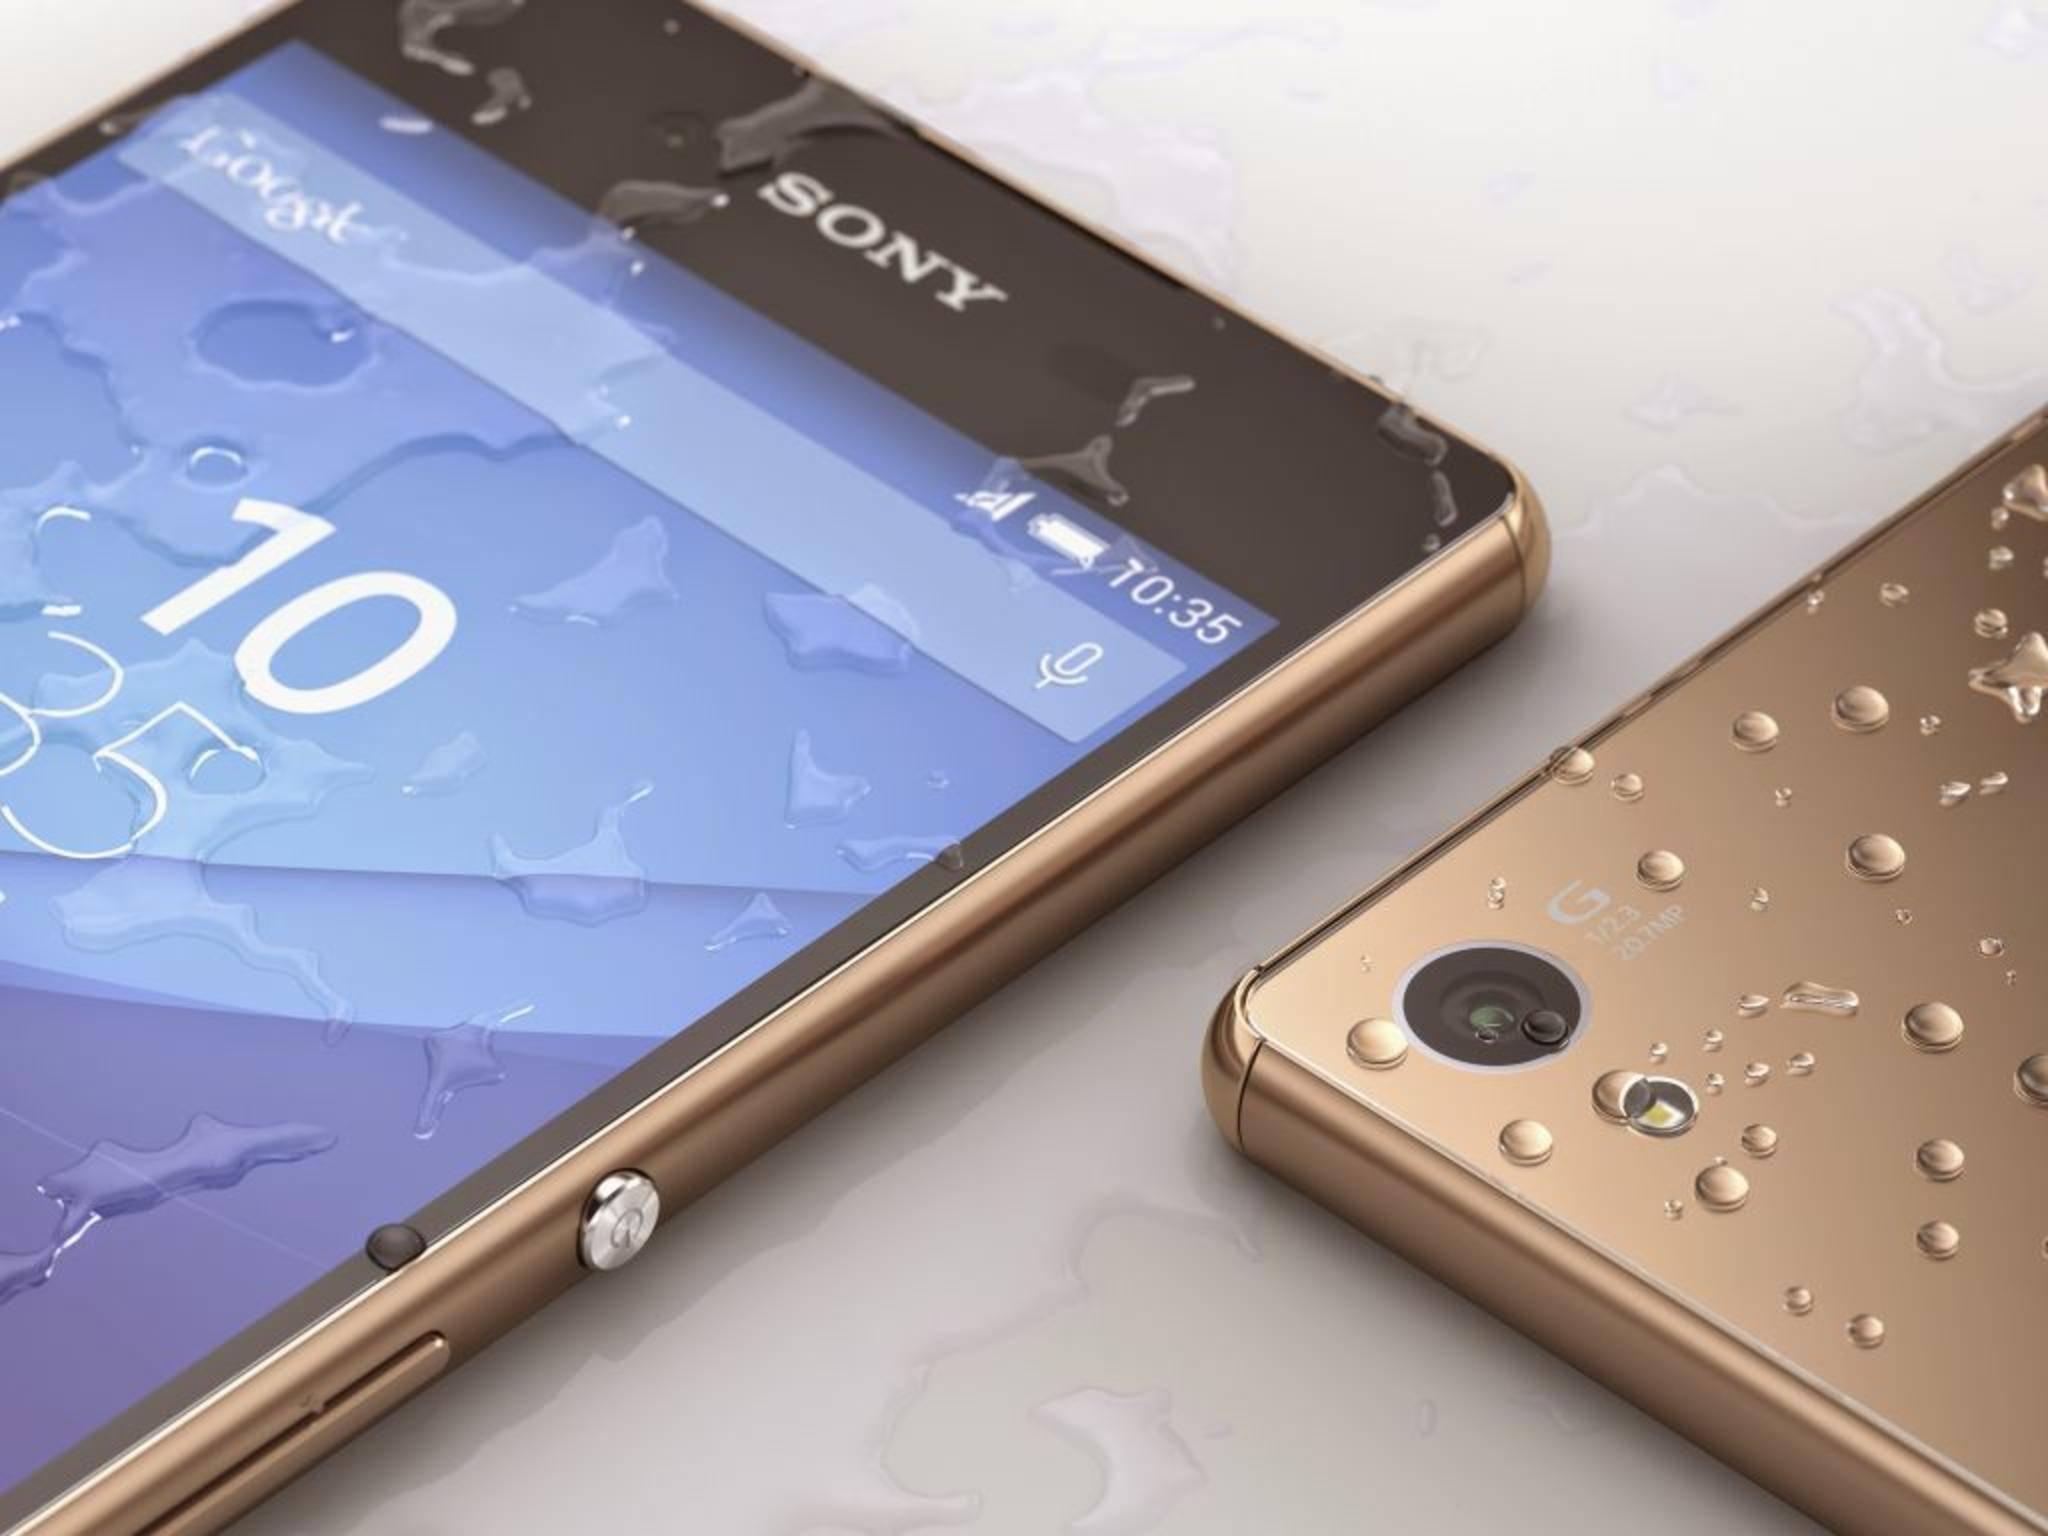 Nach dem Xperia Z3+ könnte Sony ein Xperia Z4 Compact herausbringen.